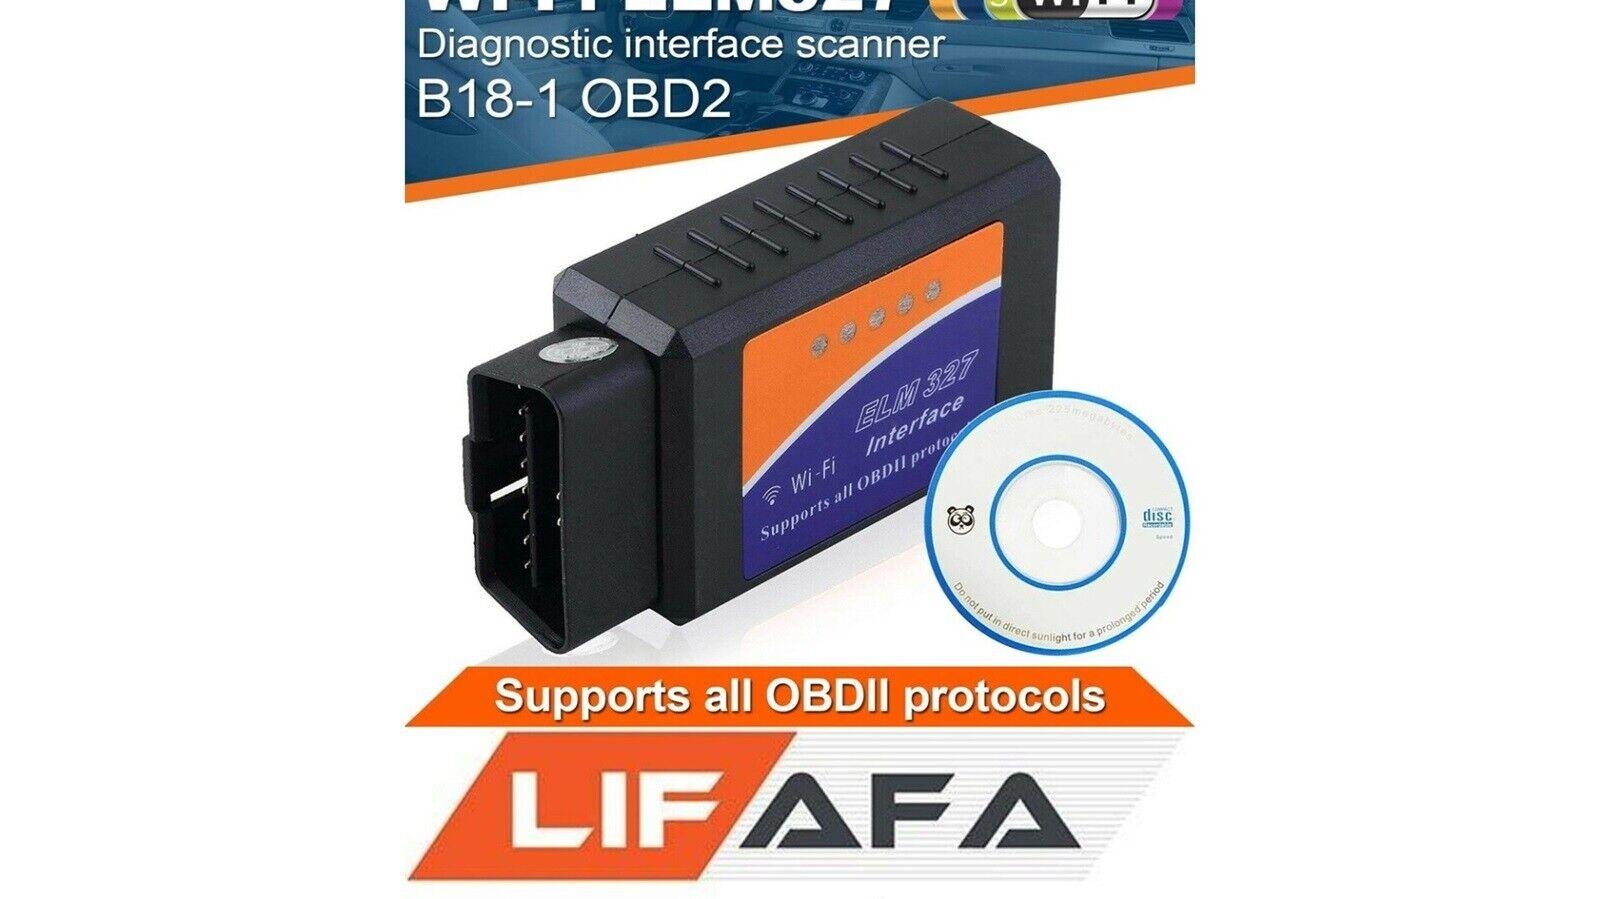 ELM327 WiFi OBD2 Diagnostic